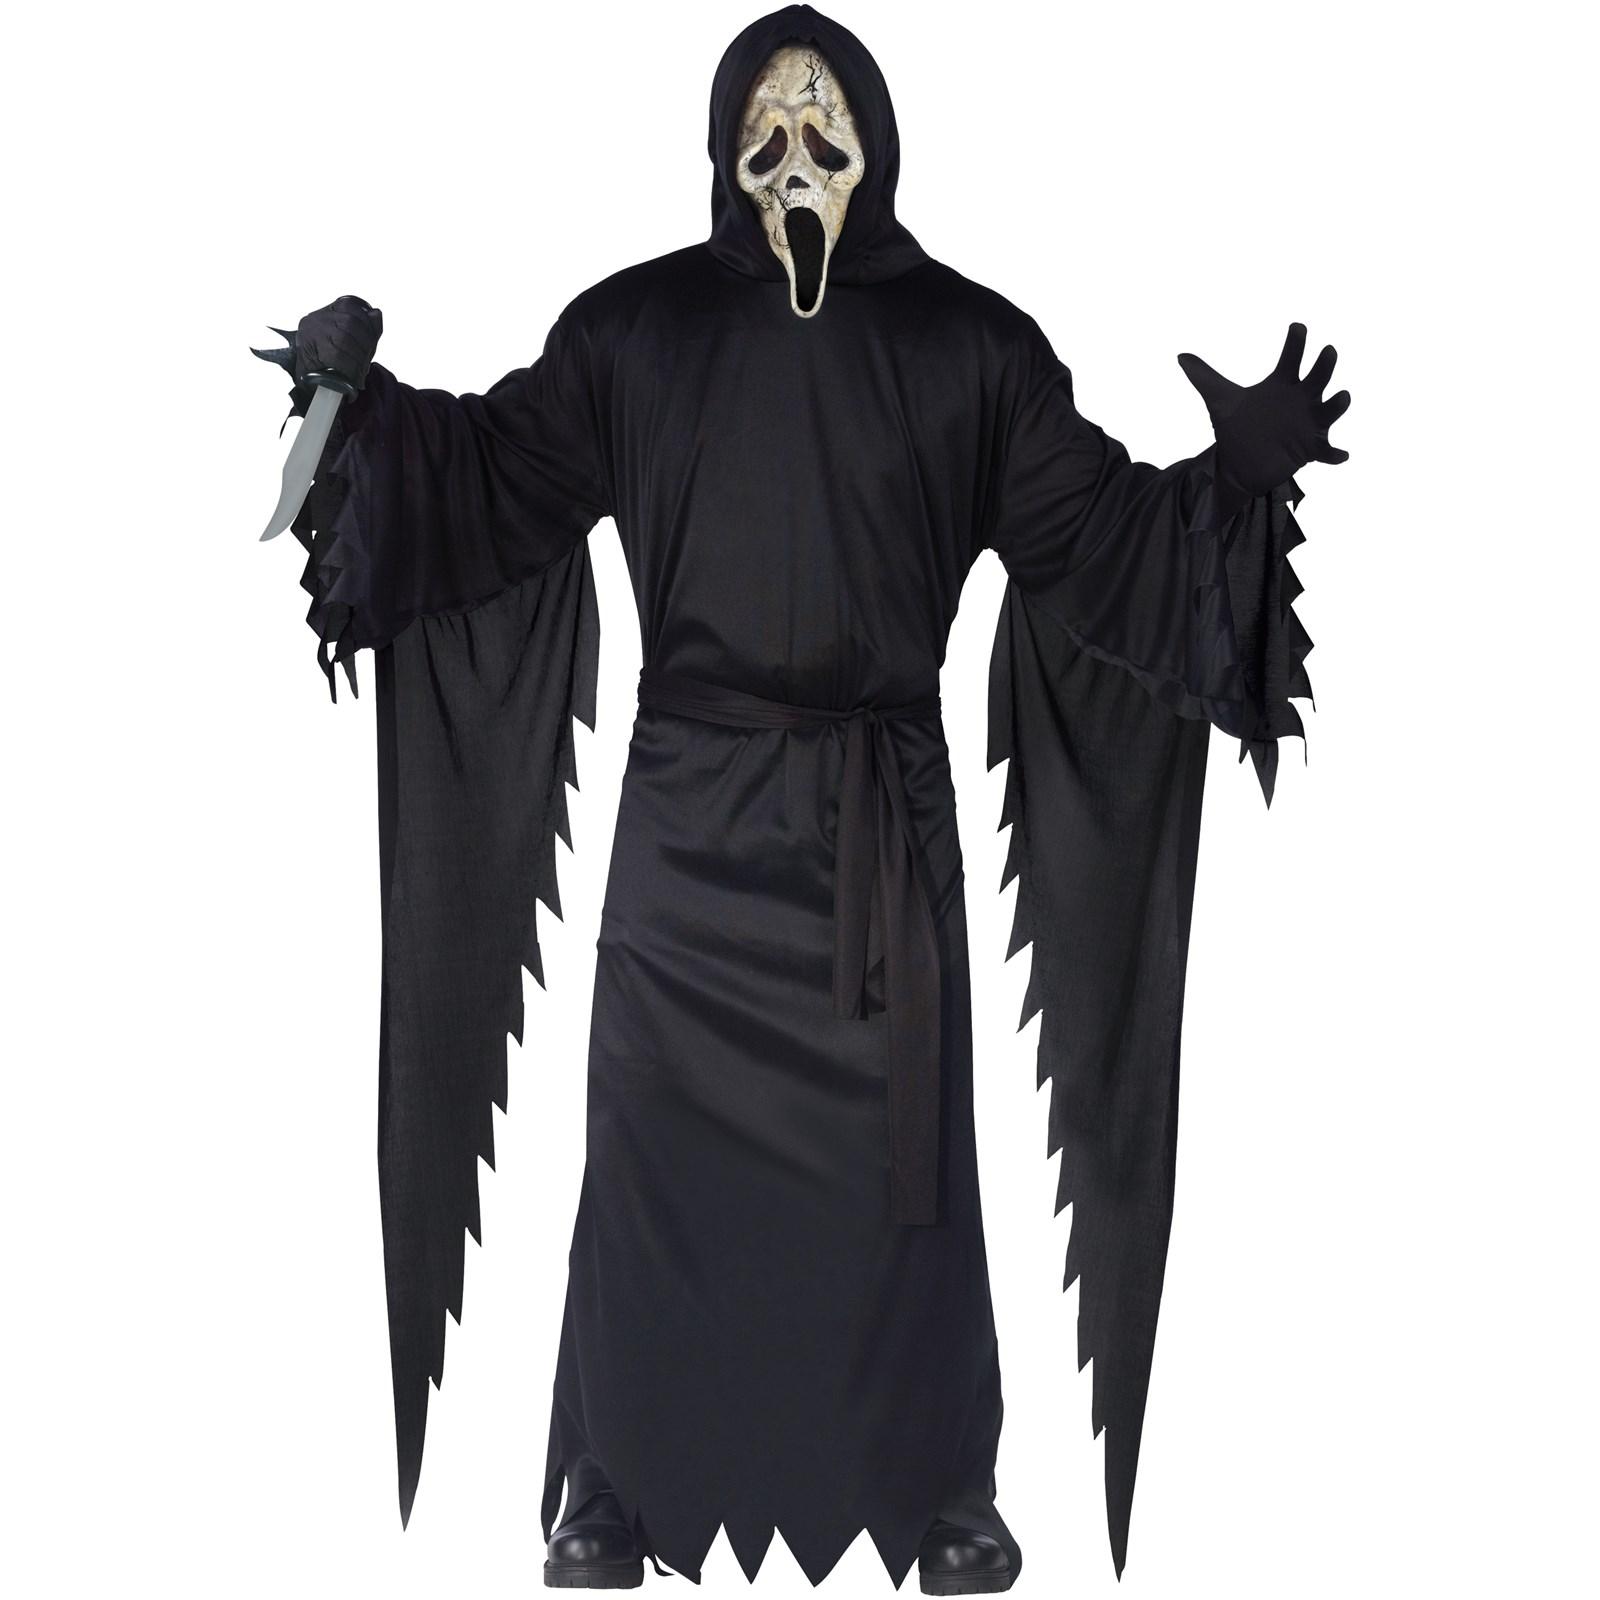 scream 4 zombie ghost face teen costume. Black Bedroom Furniture Sets. Home Design Ideas